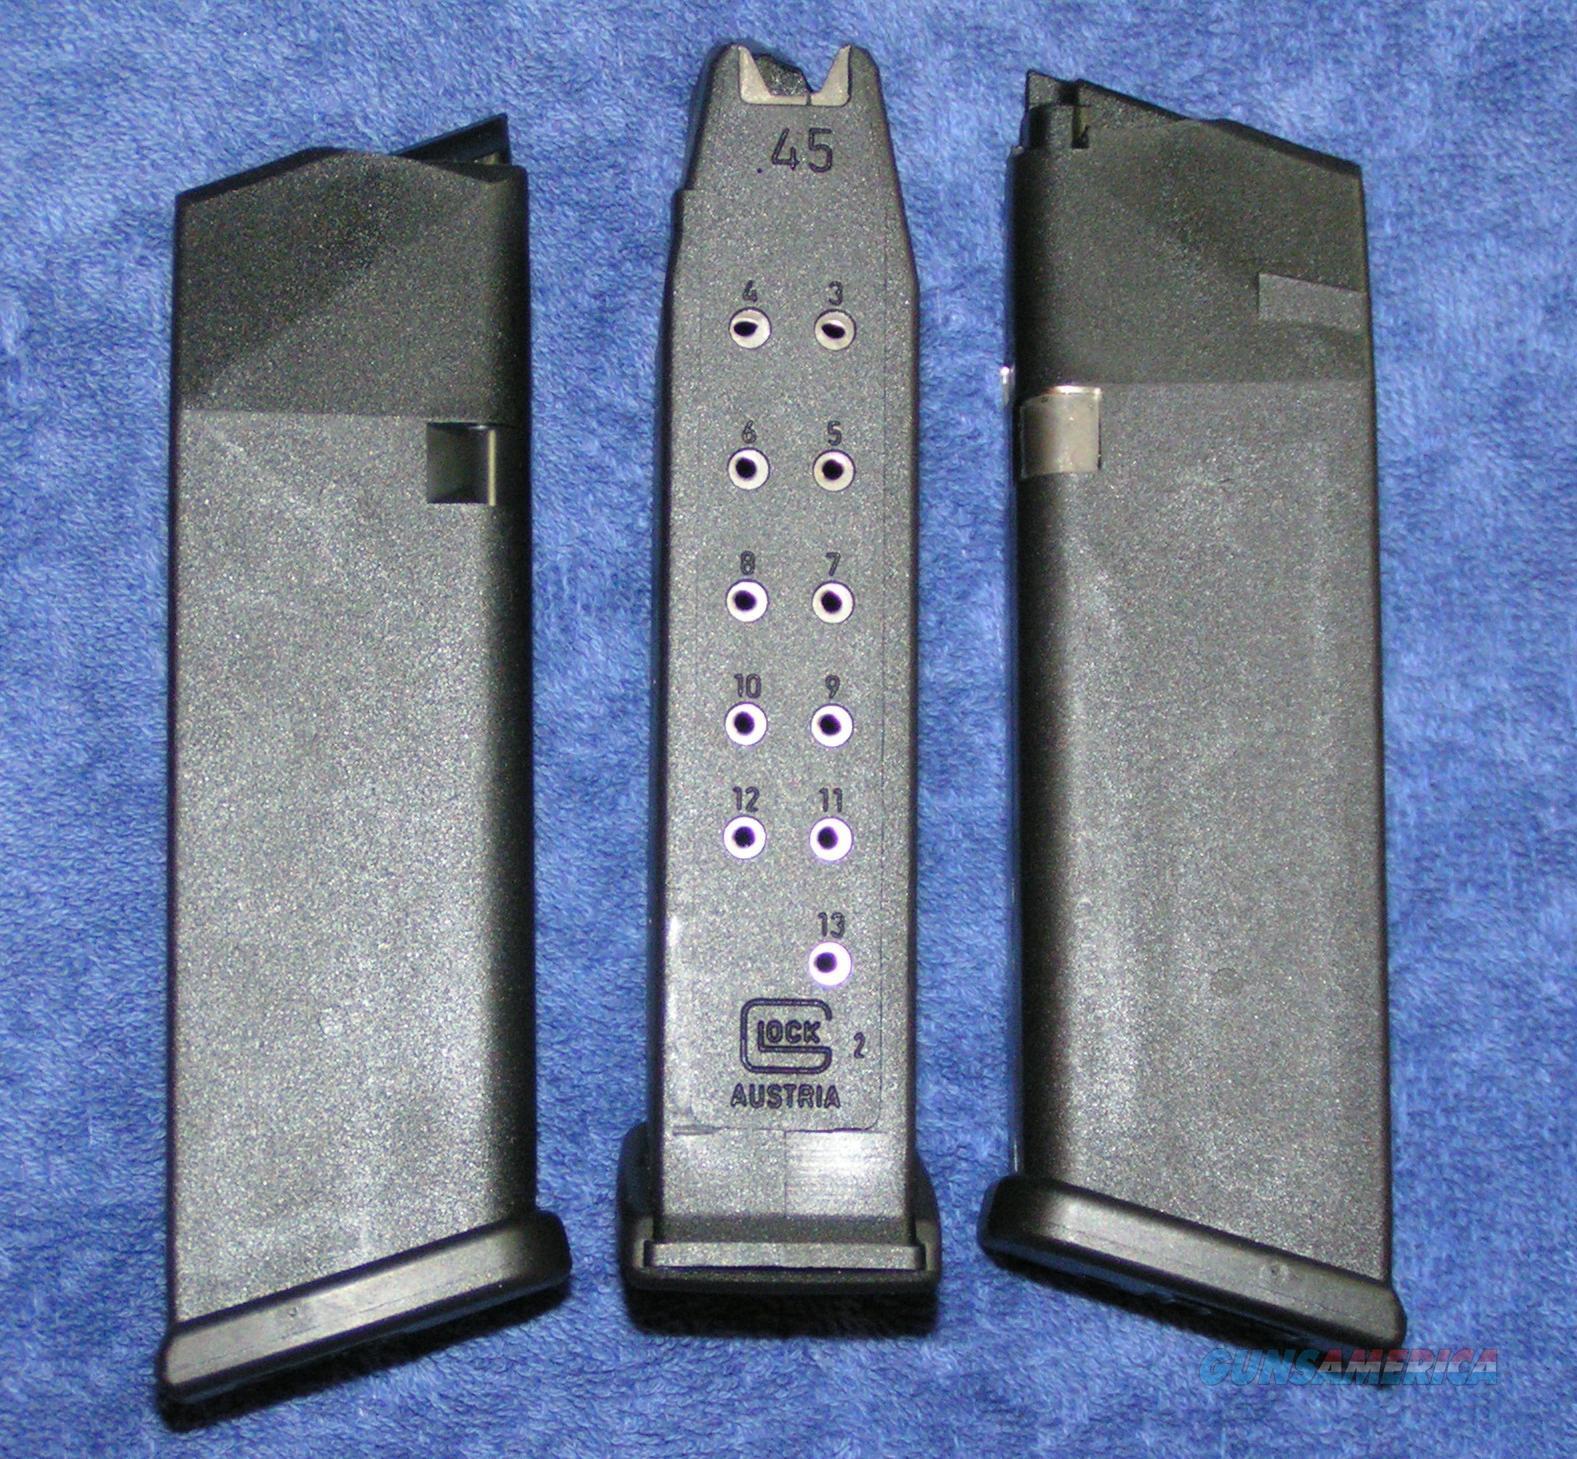 3 Glock 21 mags Factory 45ACP 13rd Gen 4 Free ship $19 each  Non-Guns > Magazines & Clips > Pistol Magazines > Glock